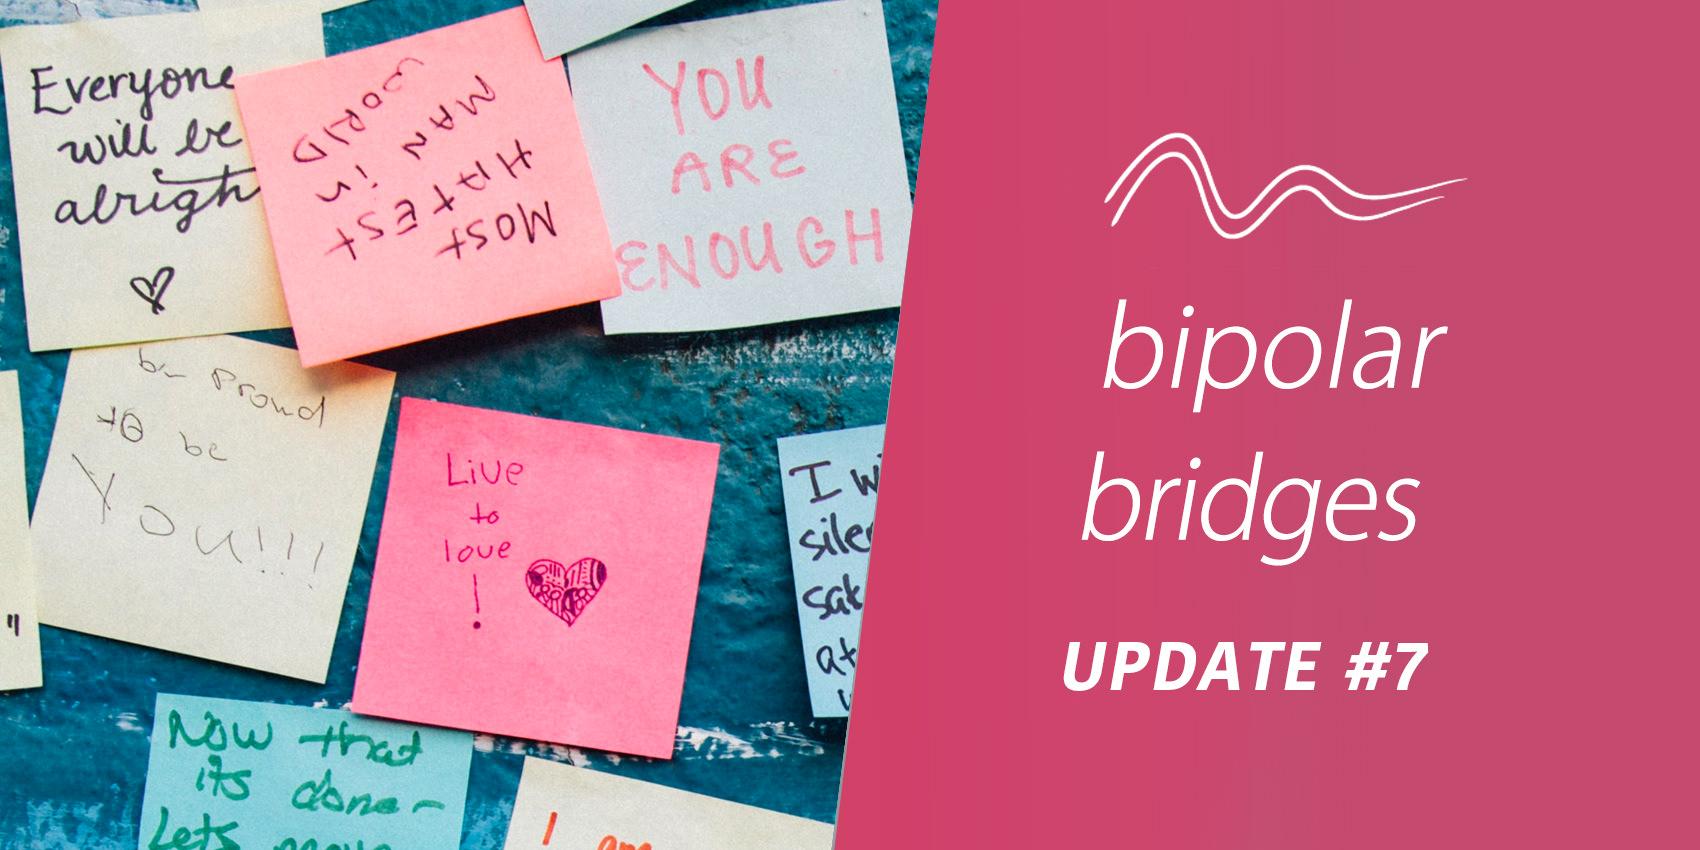 Bipolar Bridges Update #7: The App Writing Team!